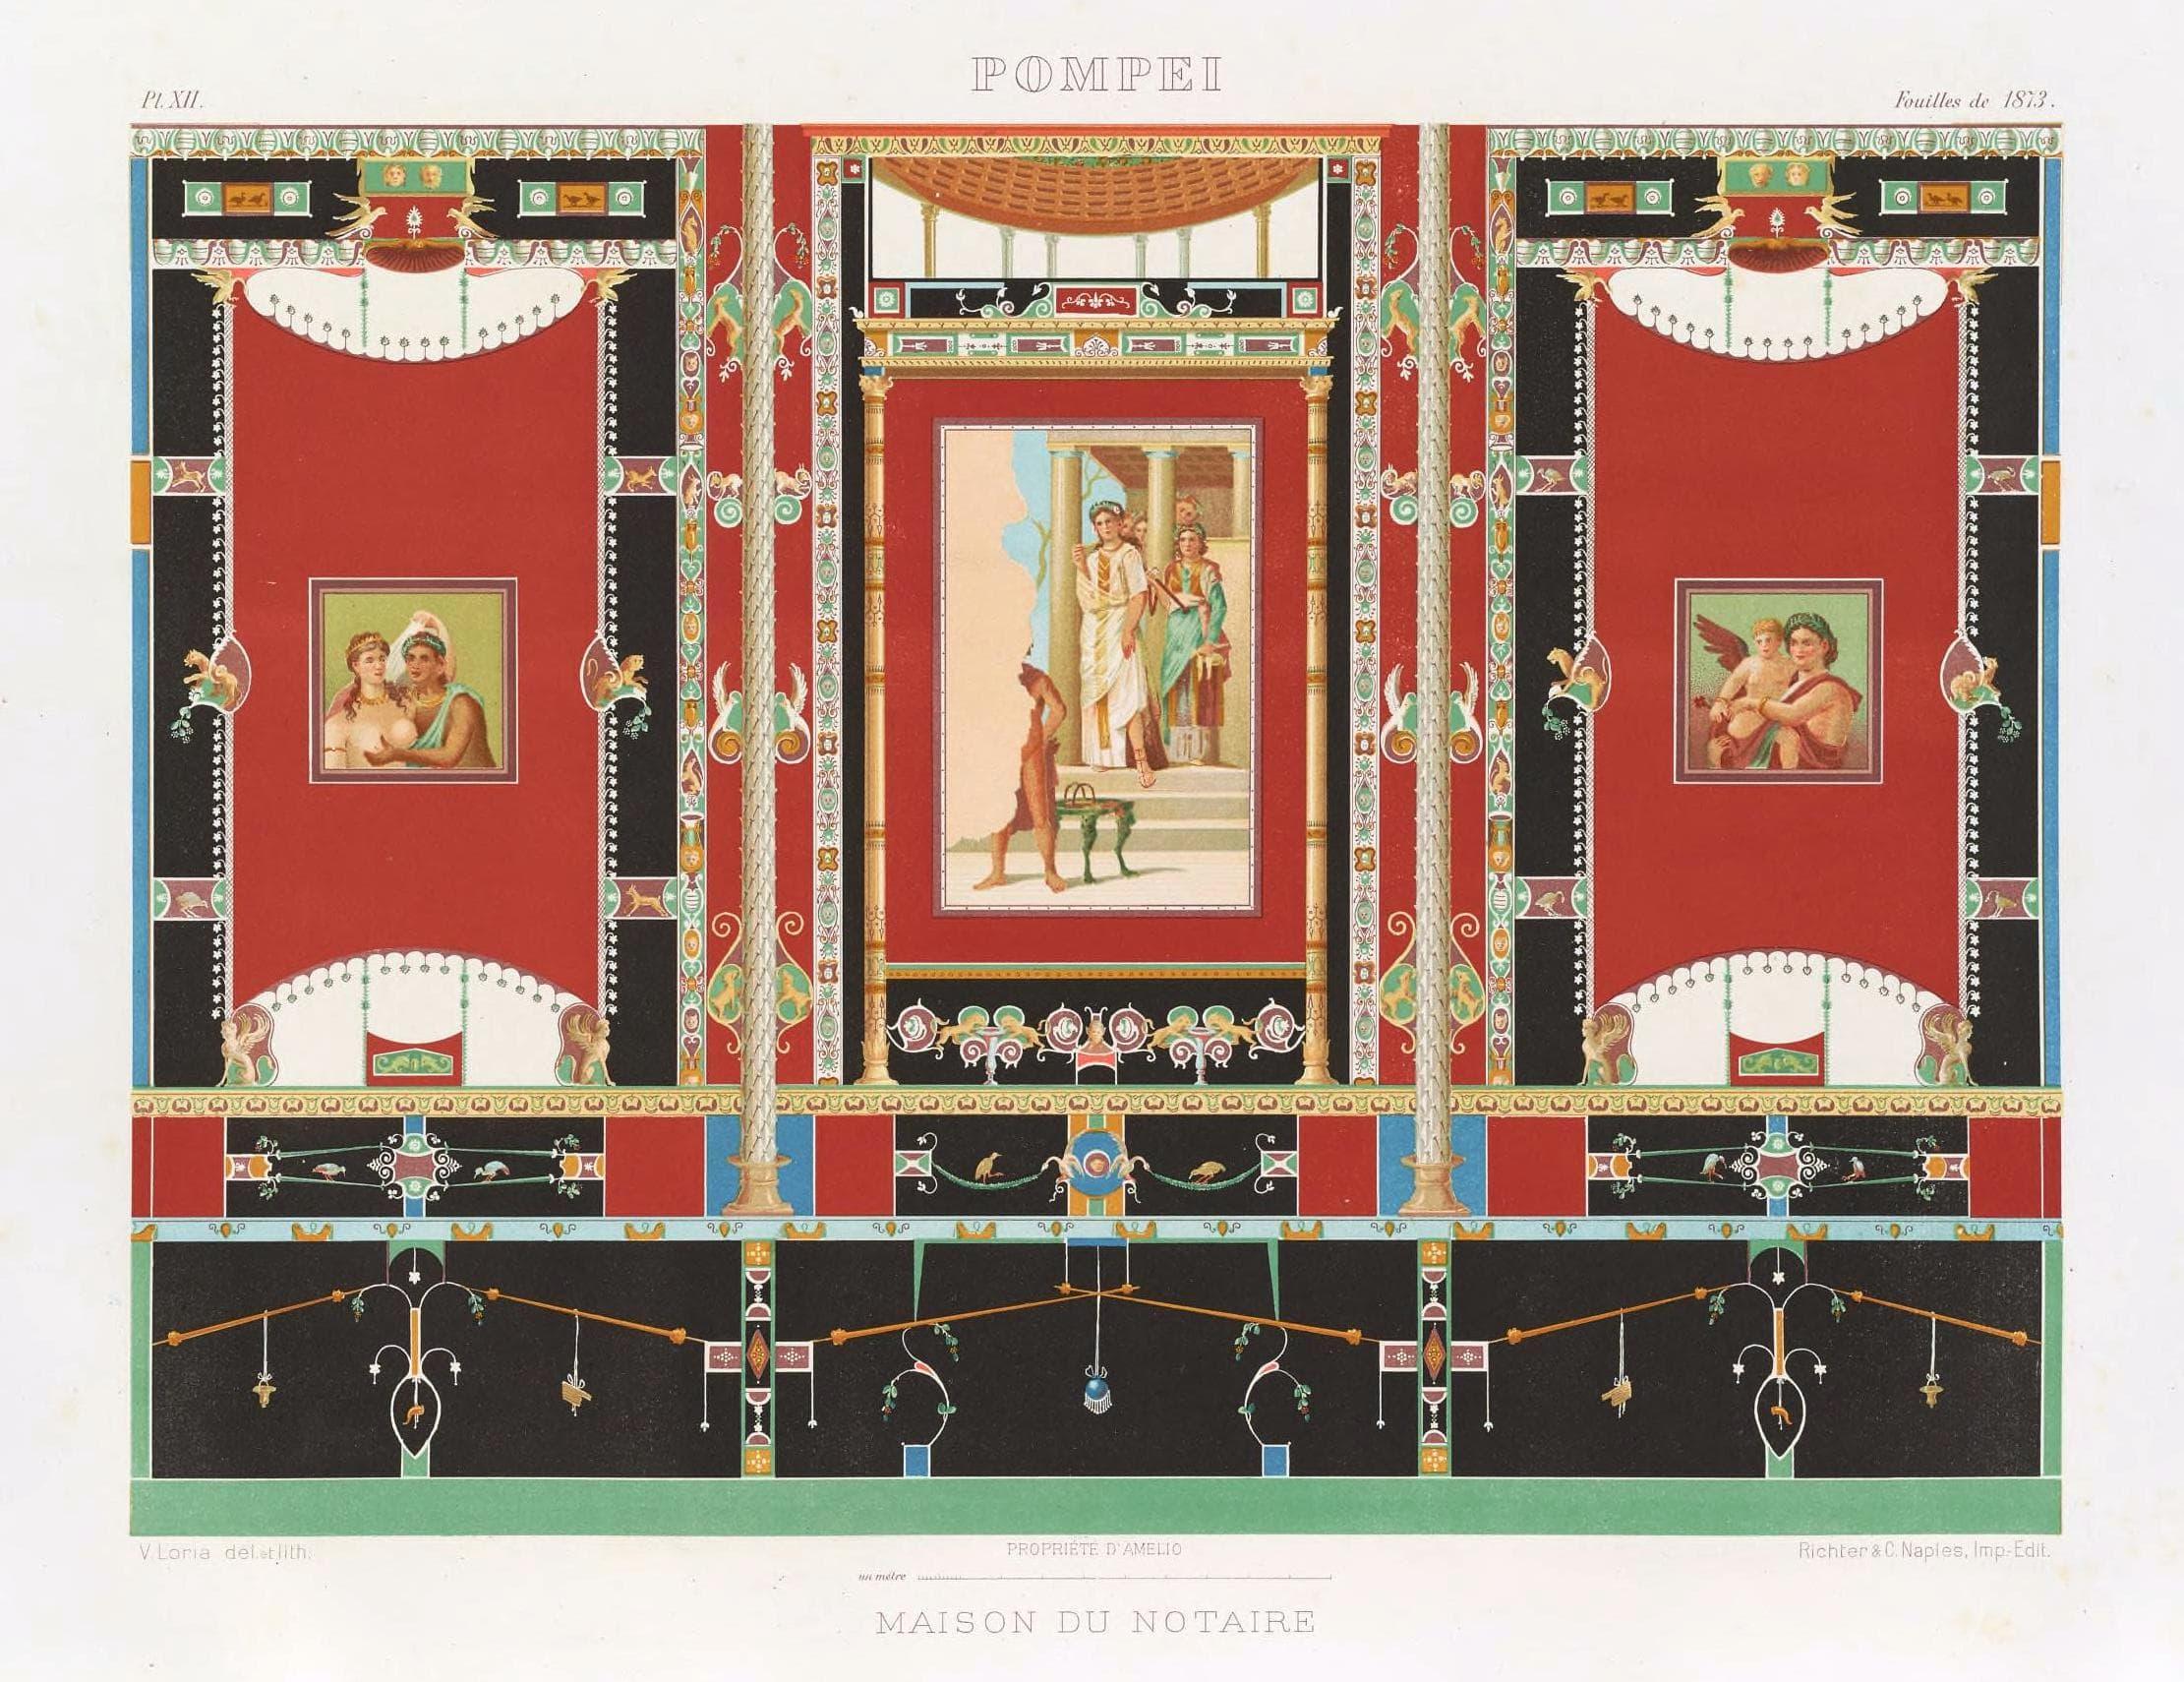 Dipinti Murali E Pittura Ad Ago : Dipinti murali scelti di pompei pompei online.net